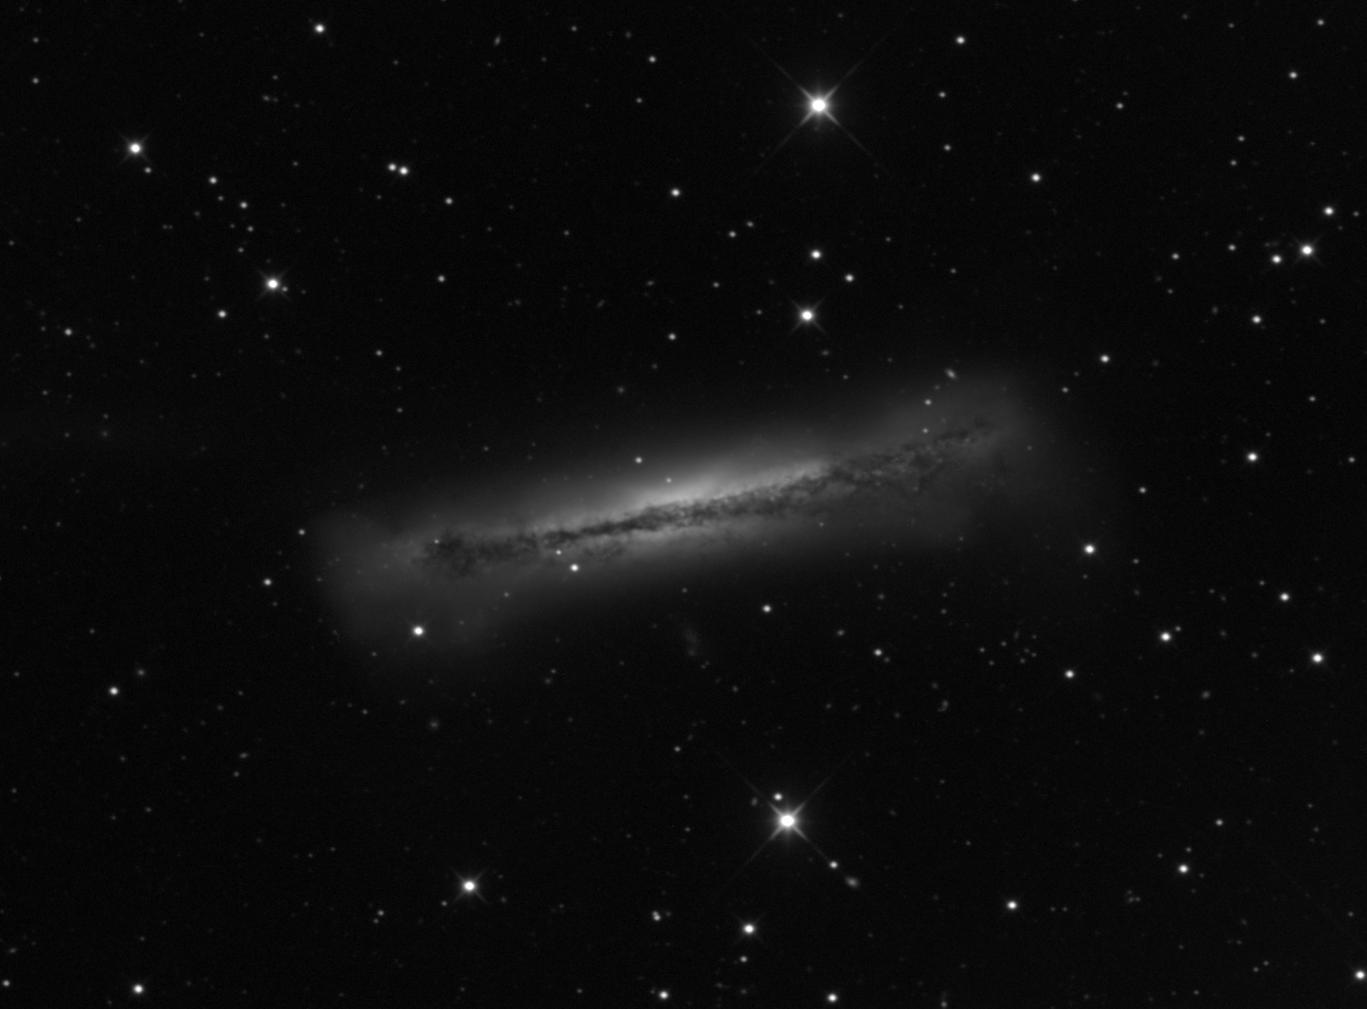 5ad4698e314d4_NGC3628mono.png.5933b81d0aaf00d975f4c61c4fb8d6cb.png